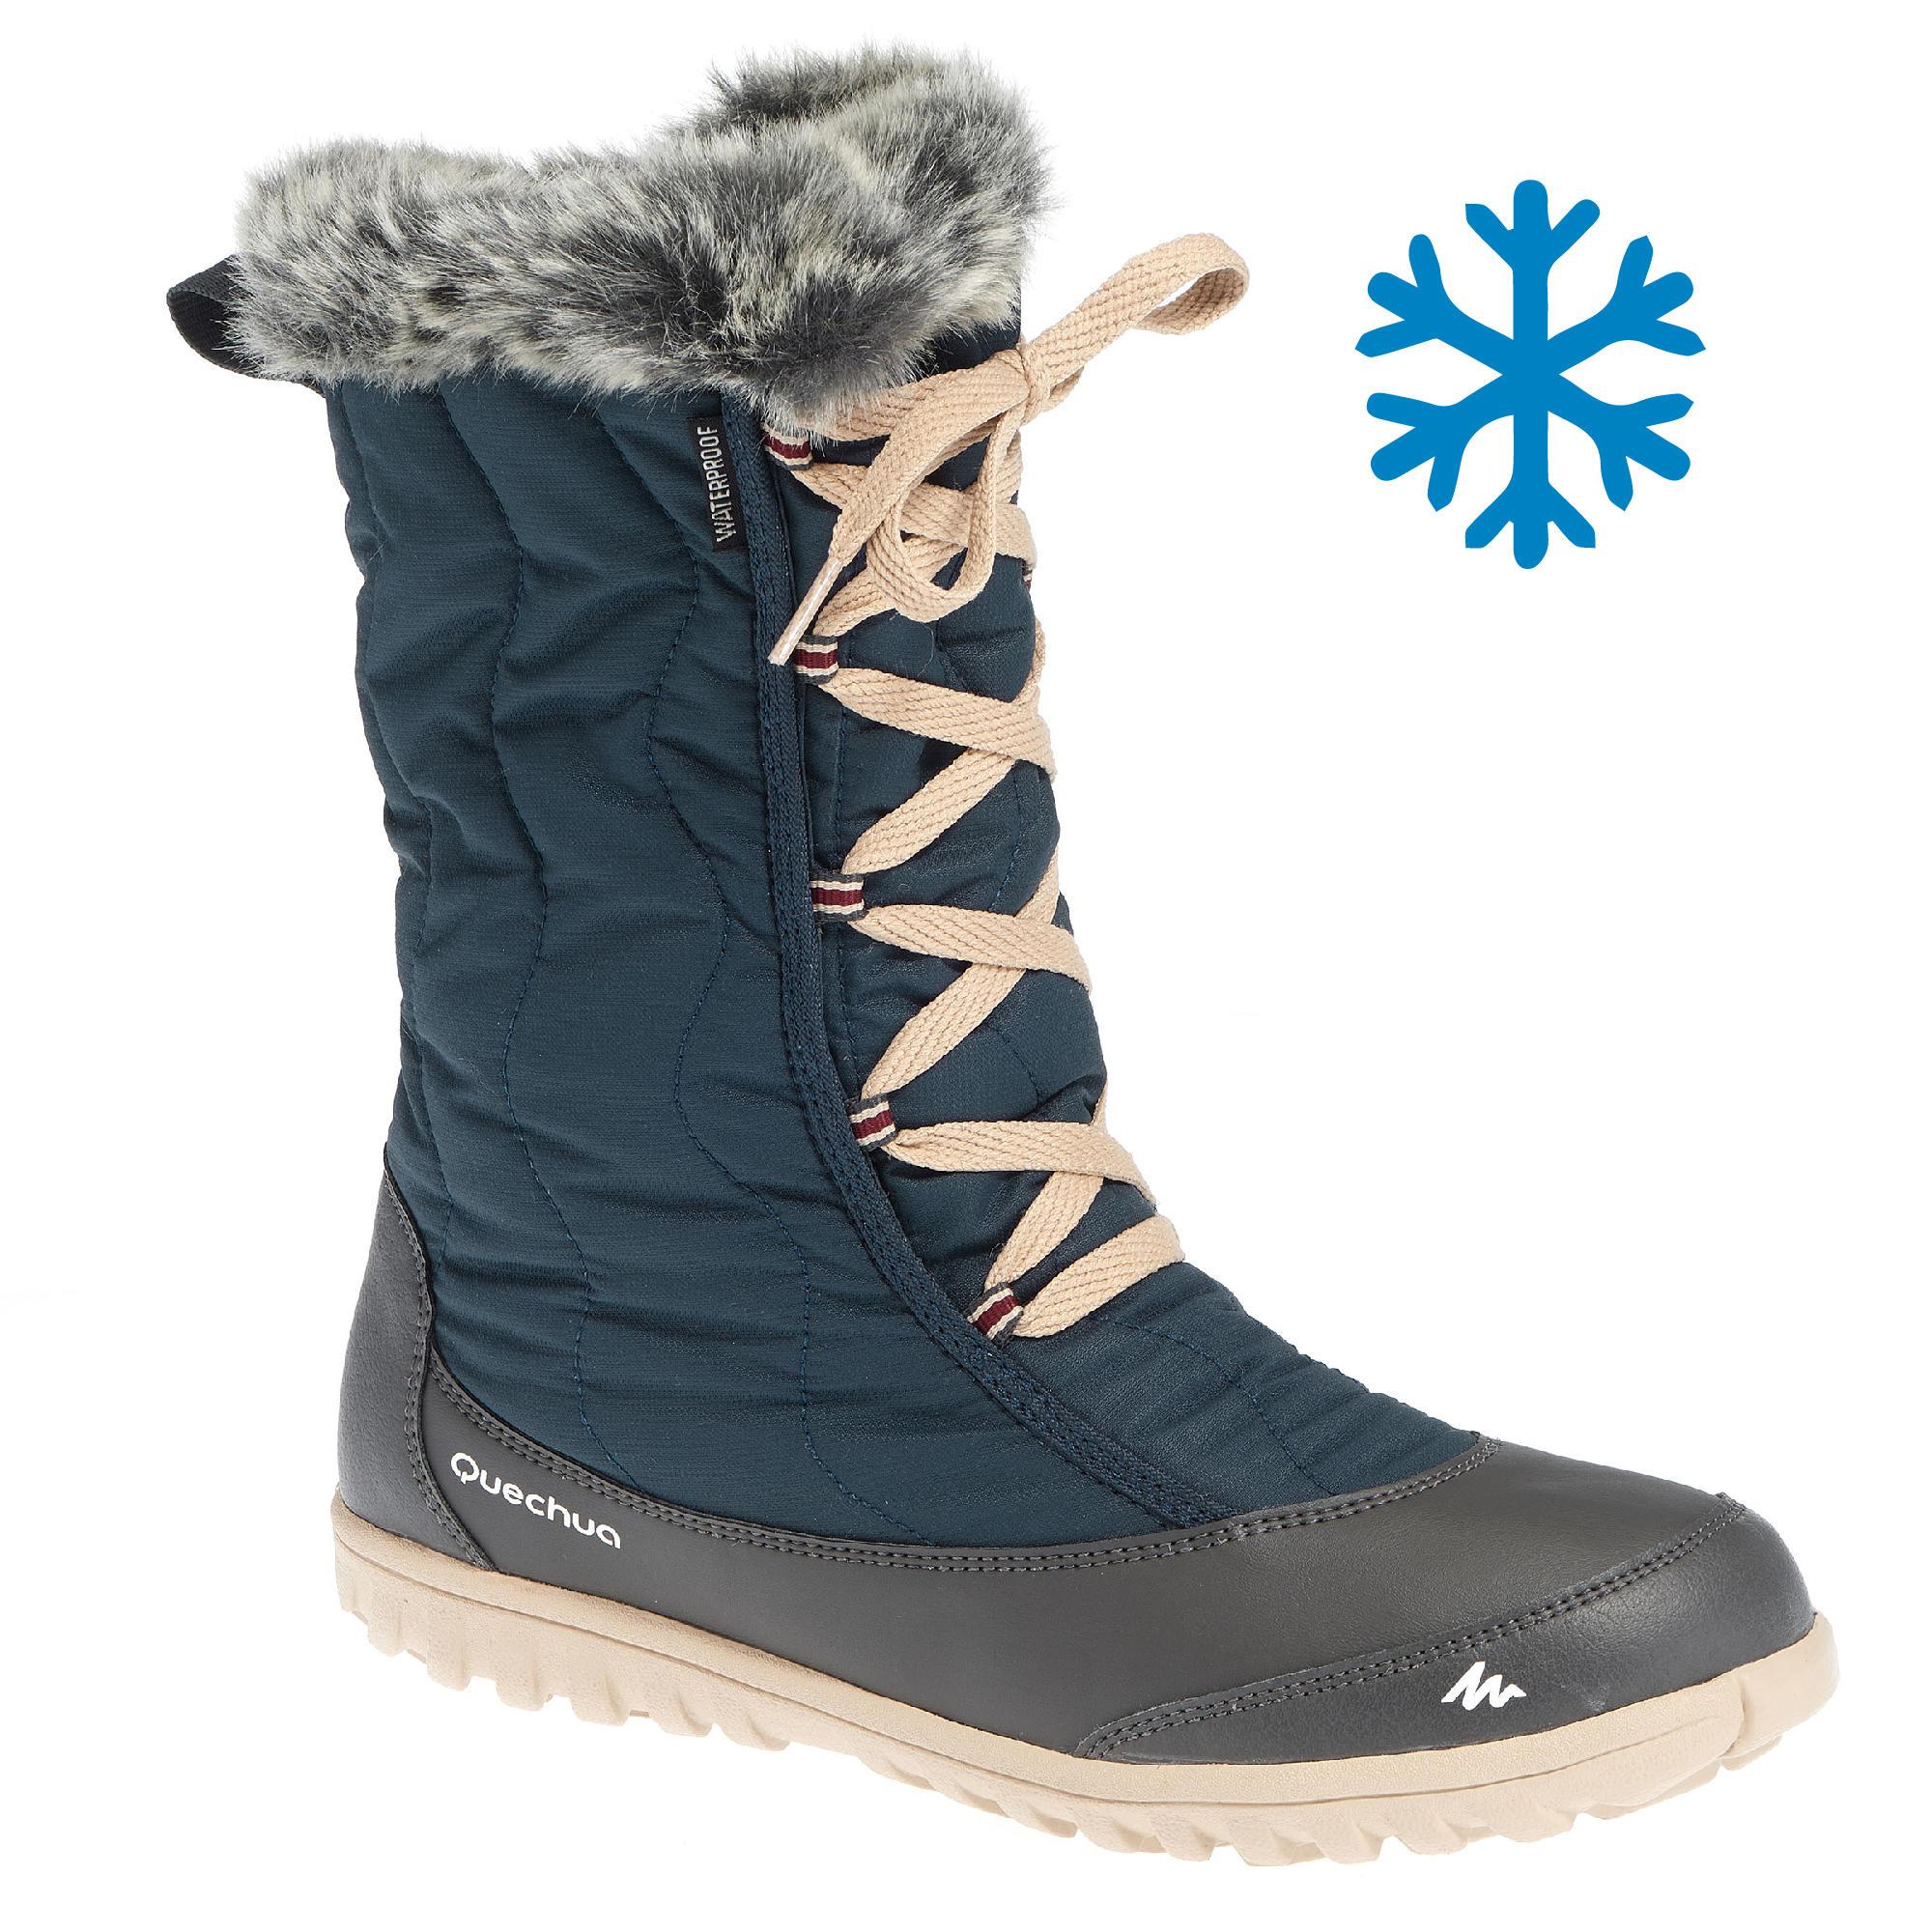 Buy Women's Snow Hiking Boots Online